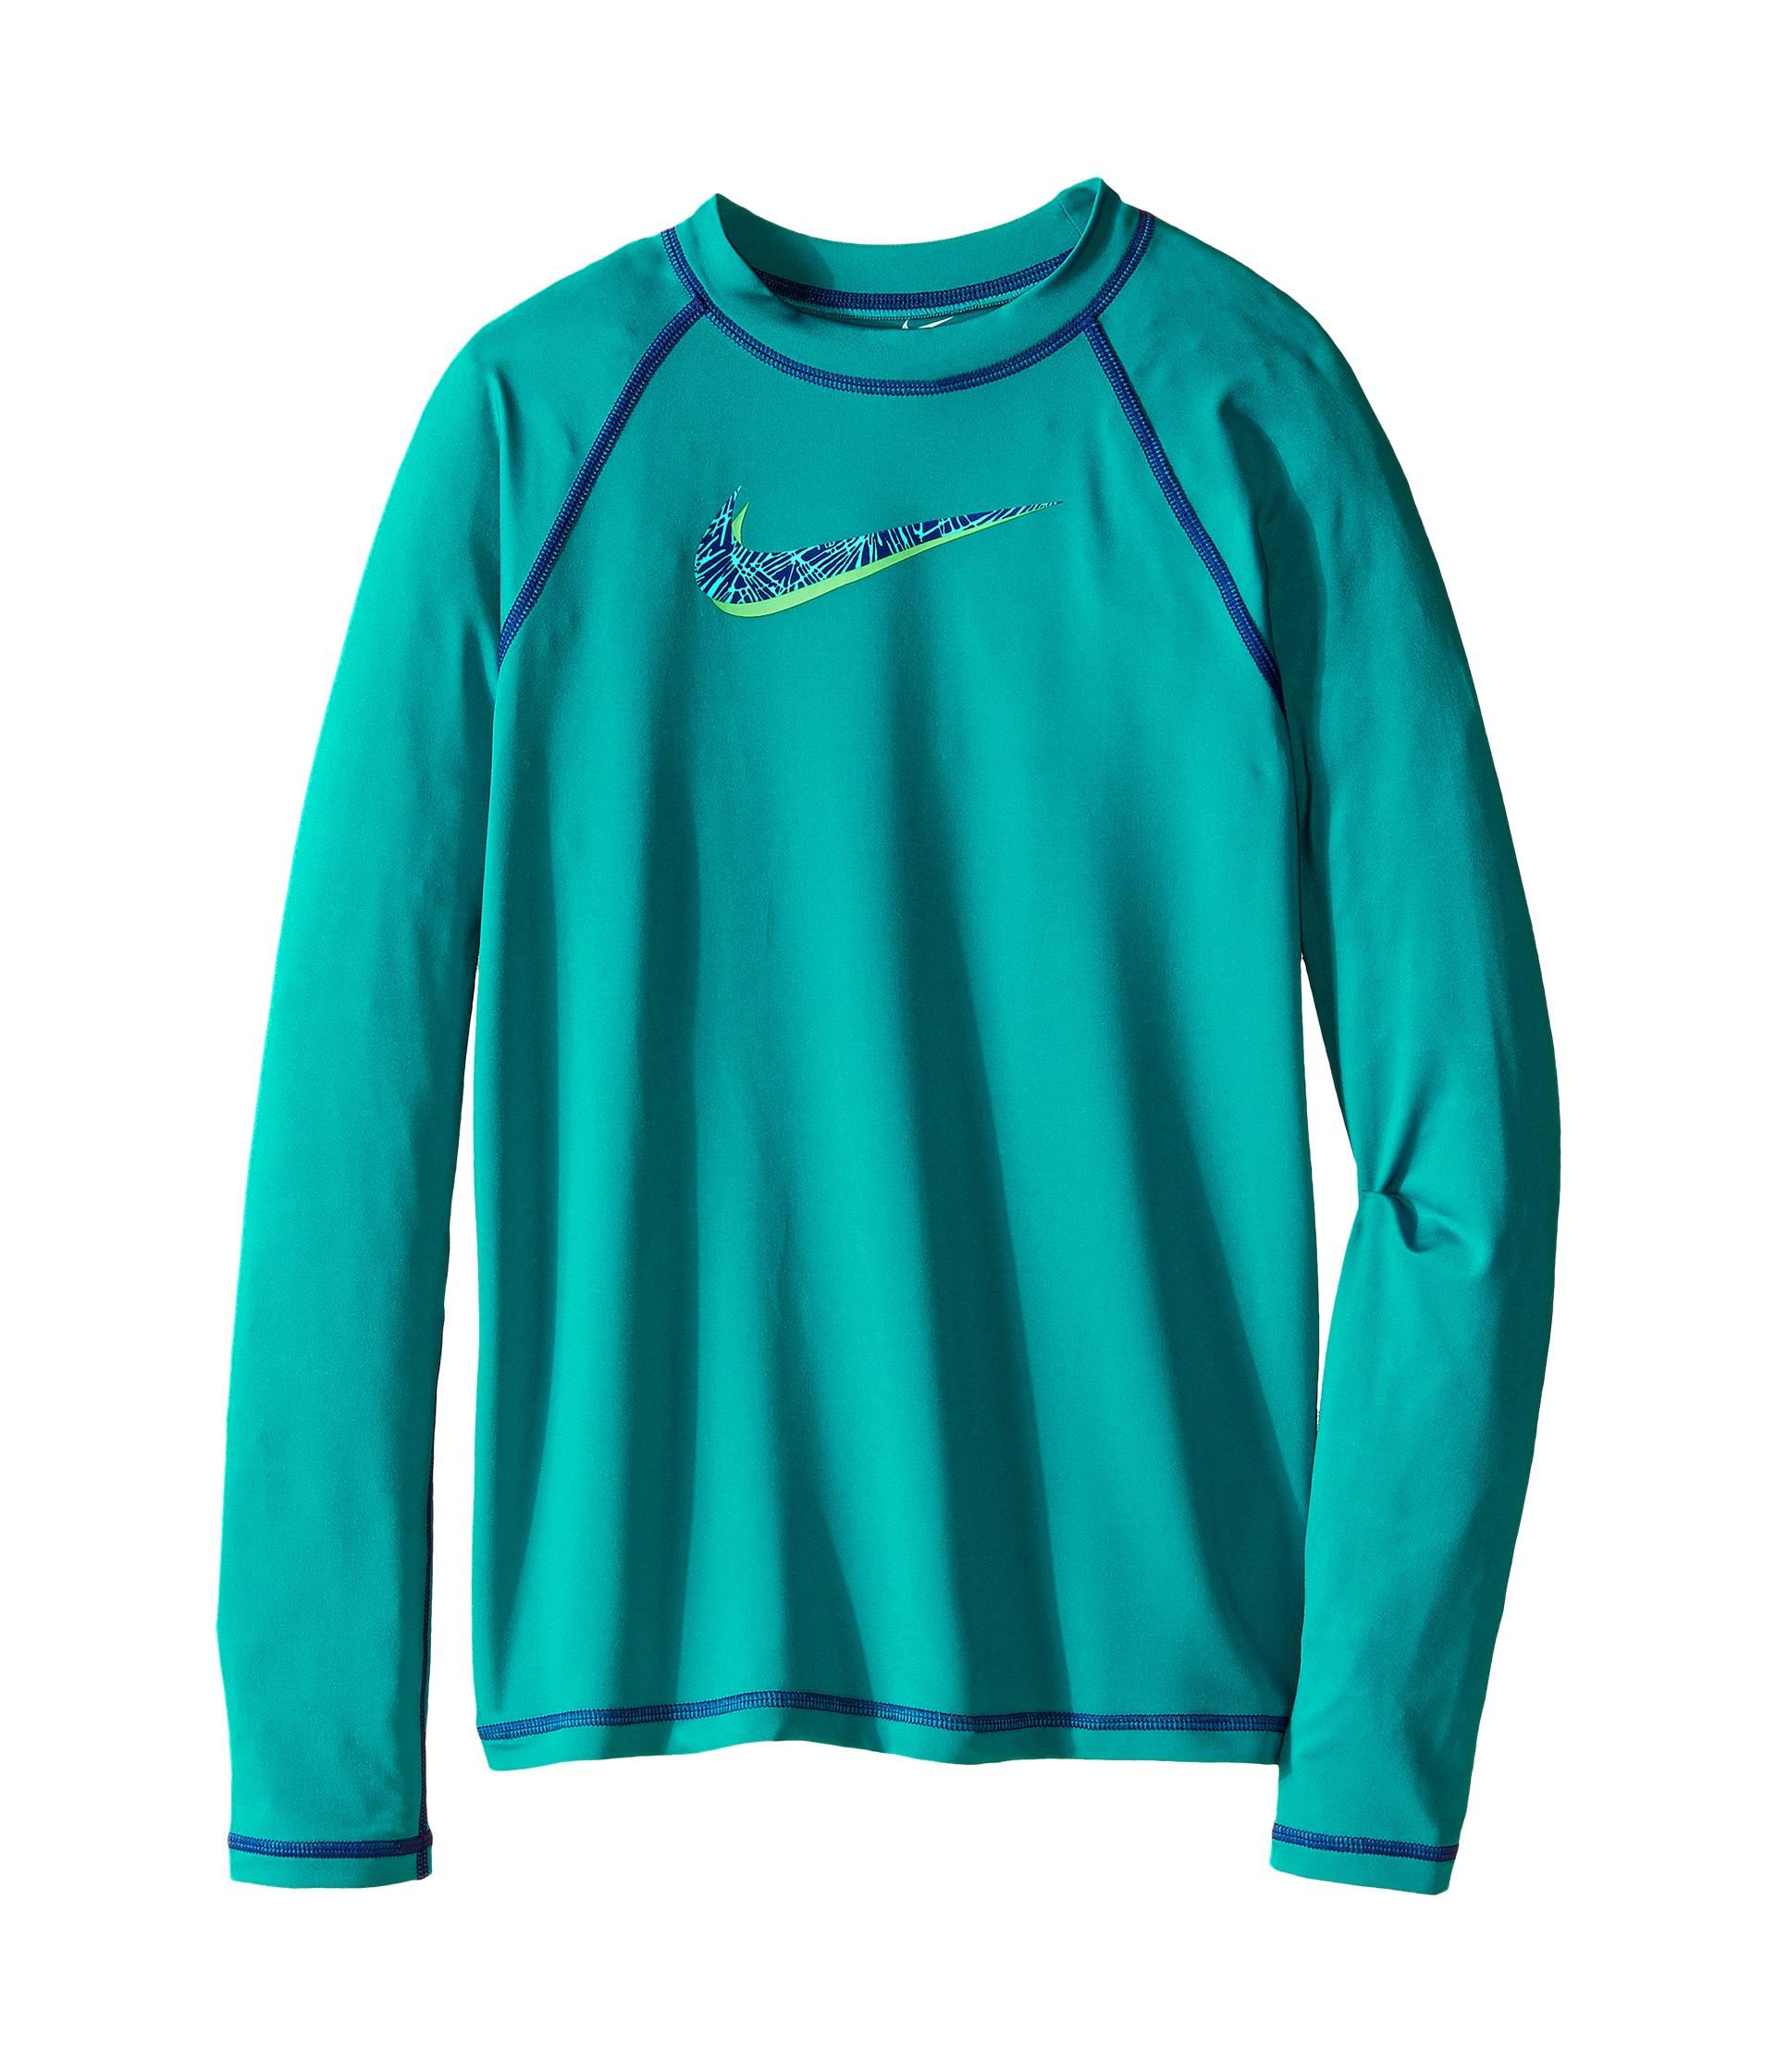 Nike kids hydro uv long sleeve swim shirt big kids for Uv shirts long sleeve